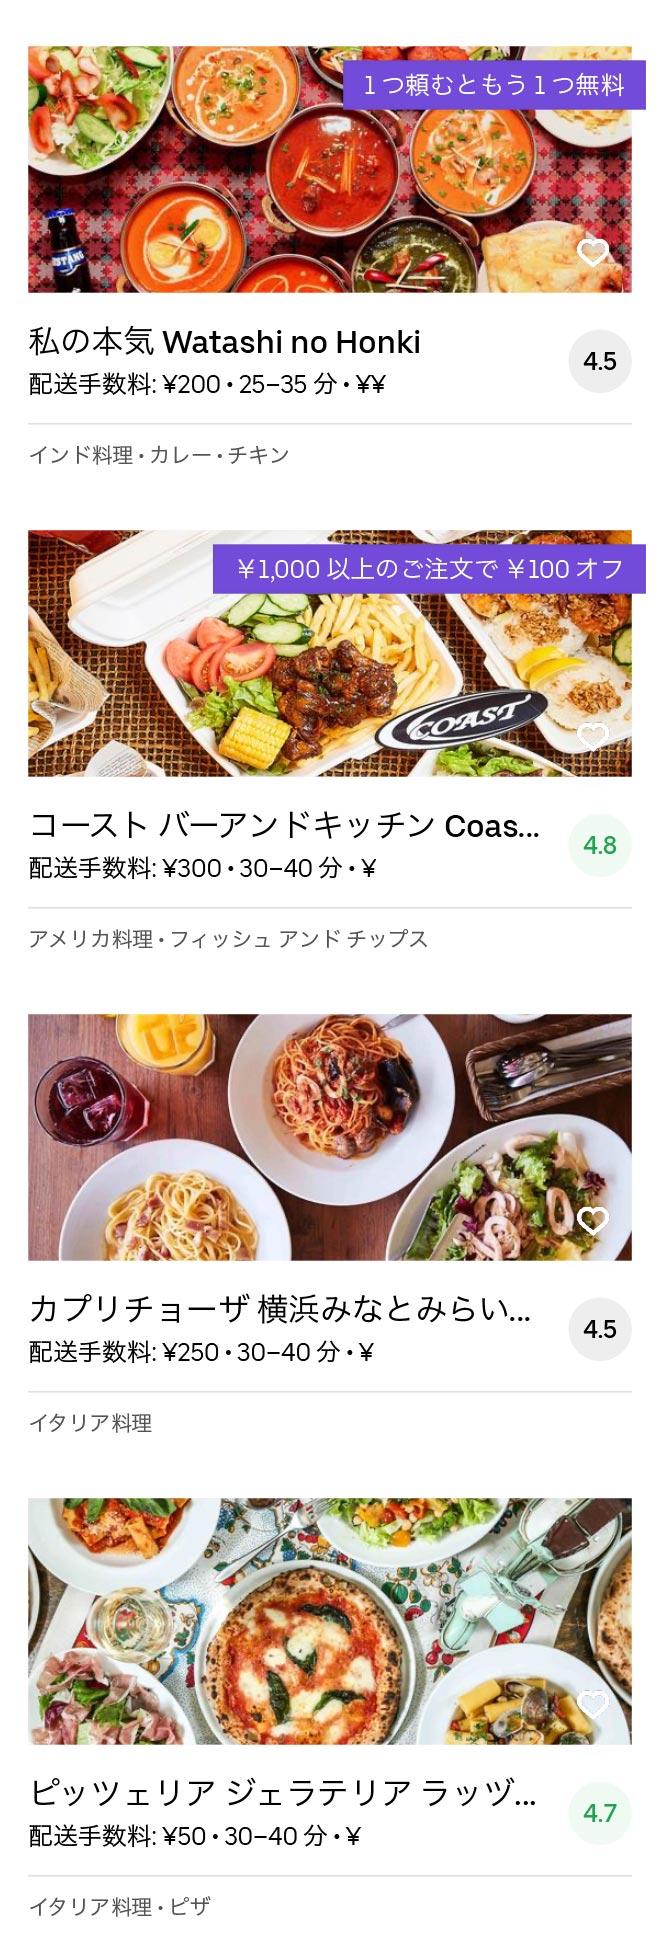 Yokohama negishi menu 2004 10